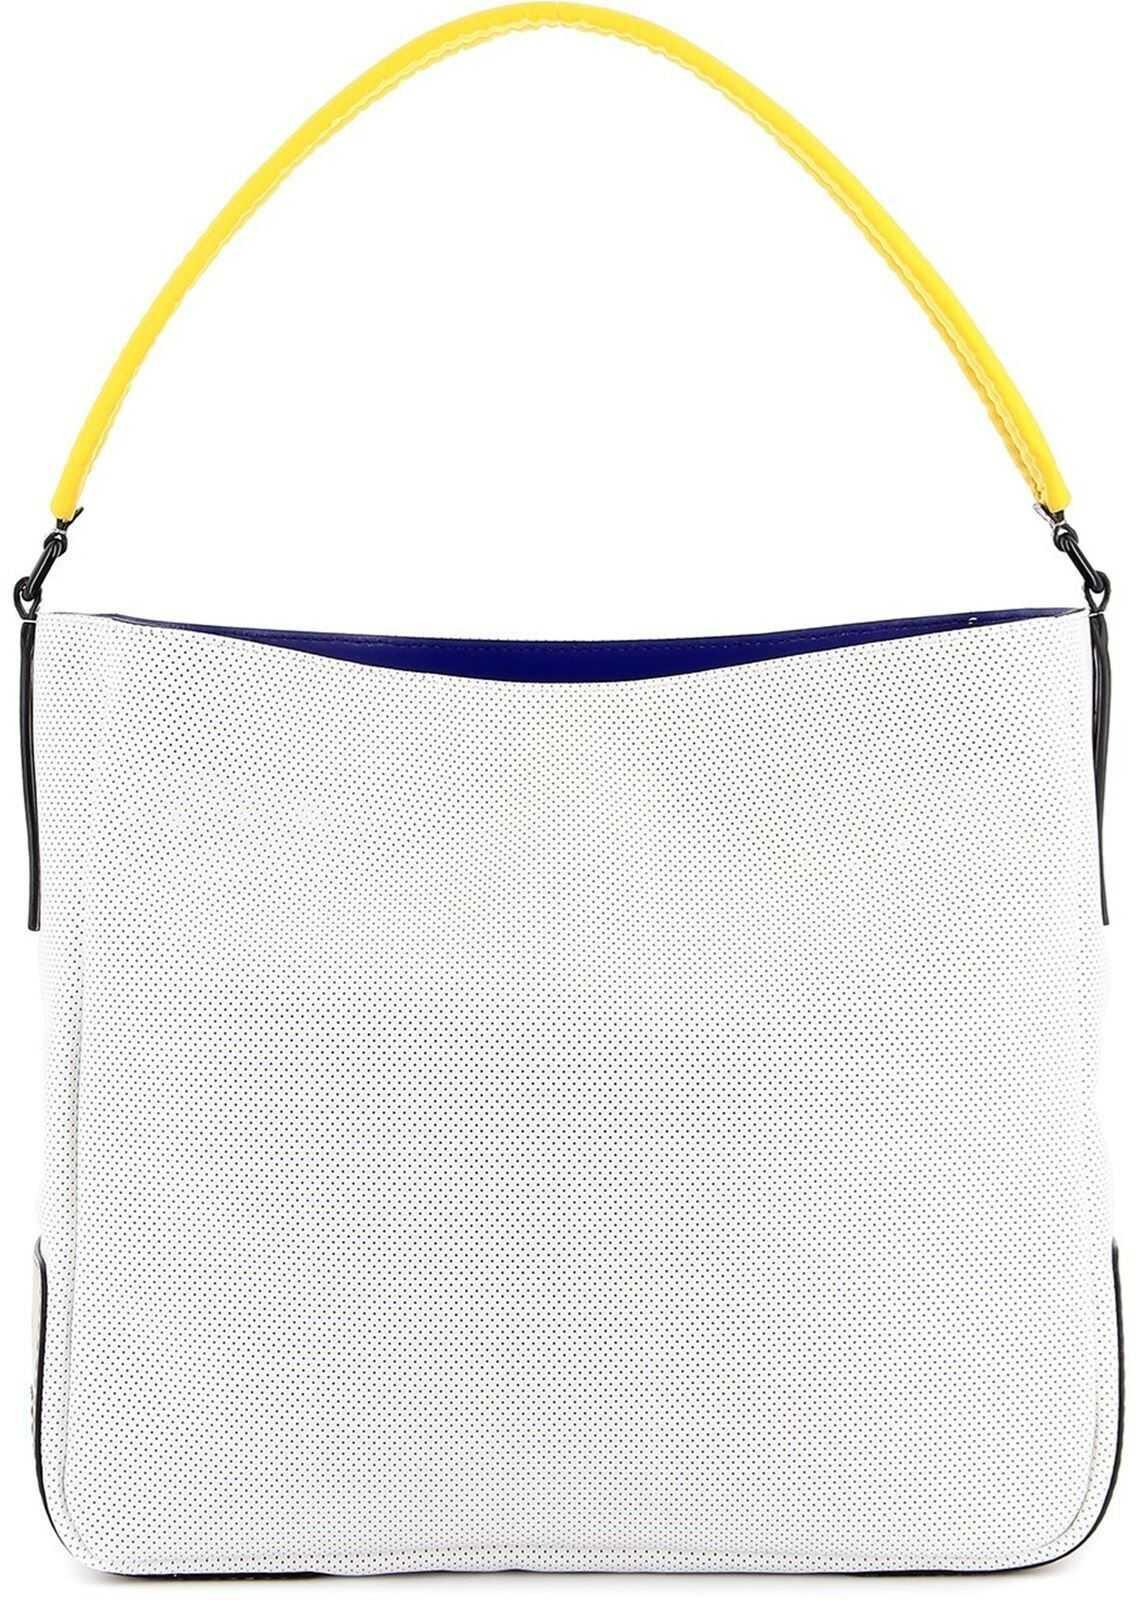 Hogan Perforated Leather Hobo Bag White